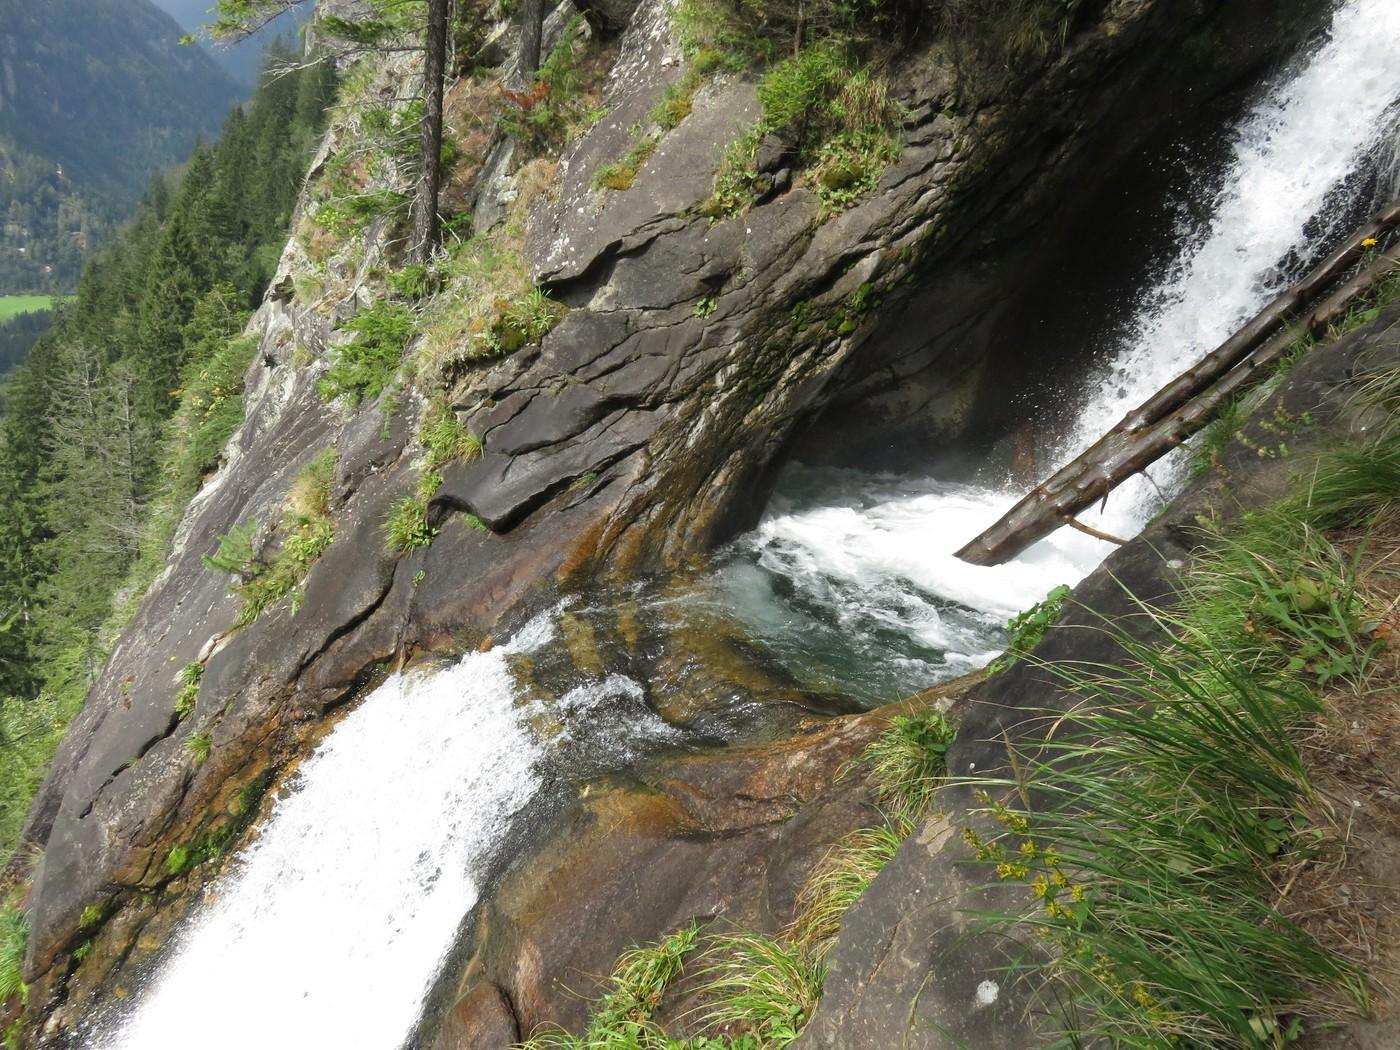 Klettersteig Fallbach : Klettersteig fallbach maltatal: youtube.